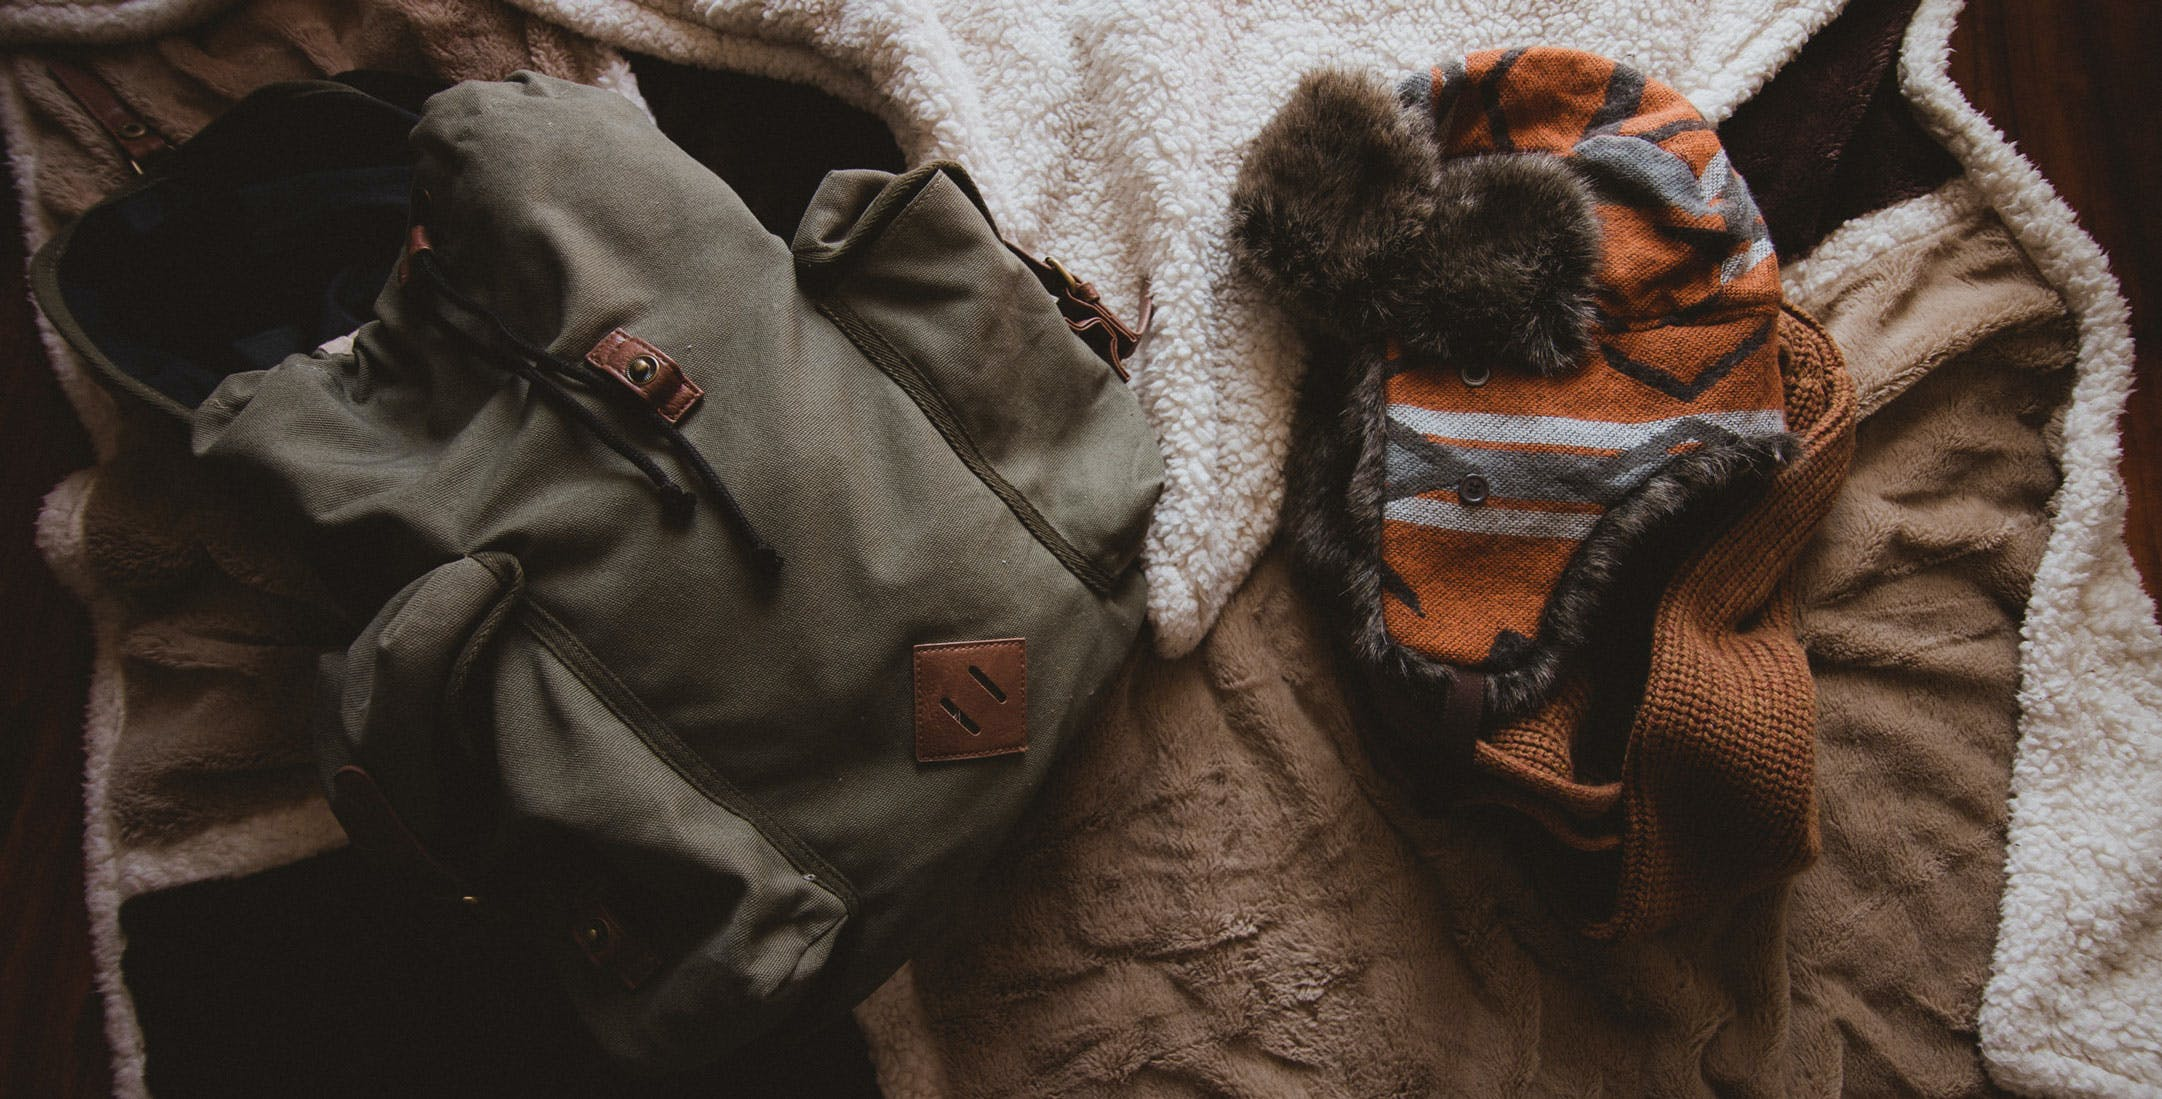 Gray Backpack Beside Orange Knit Hat